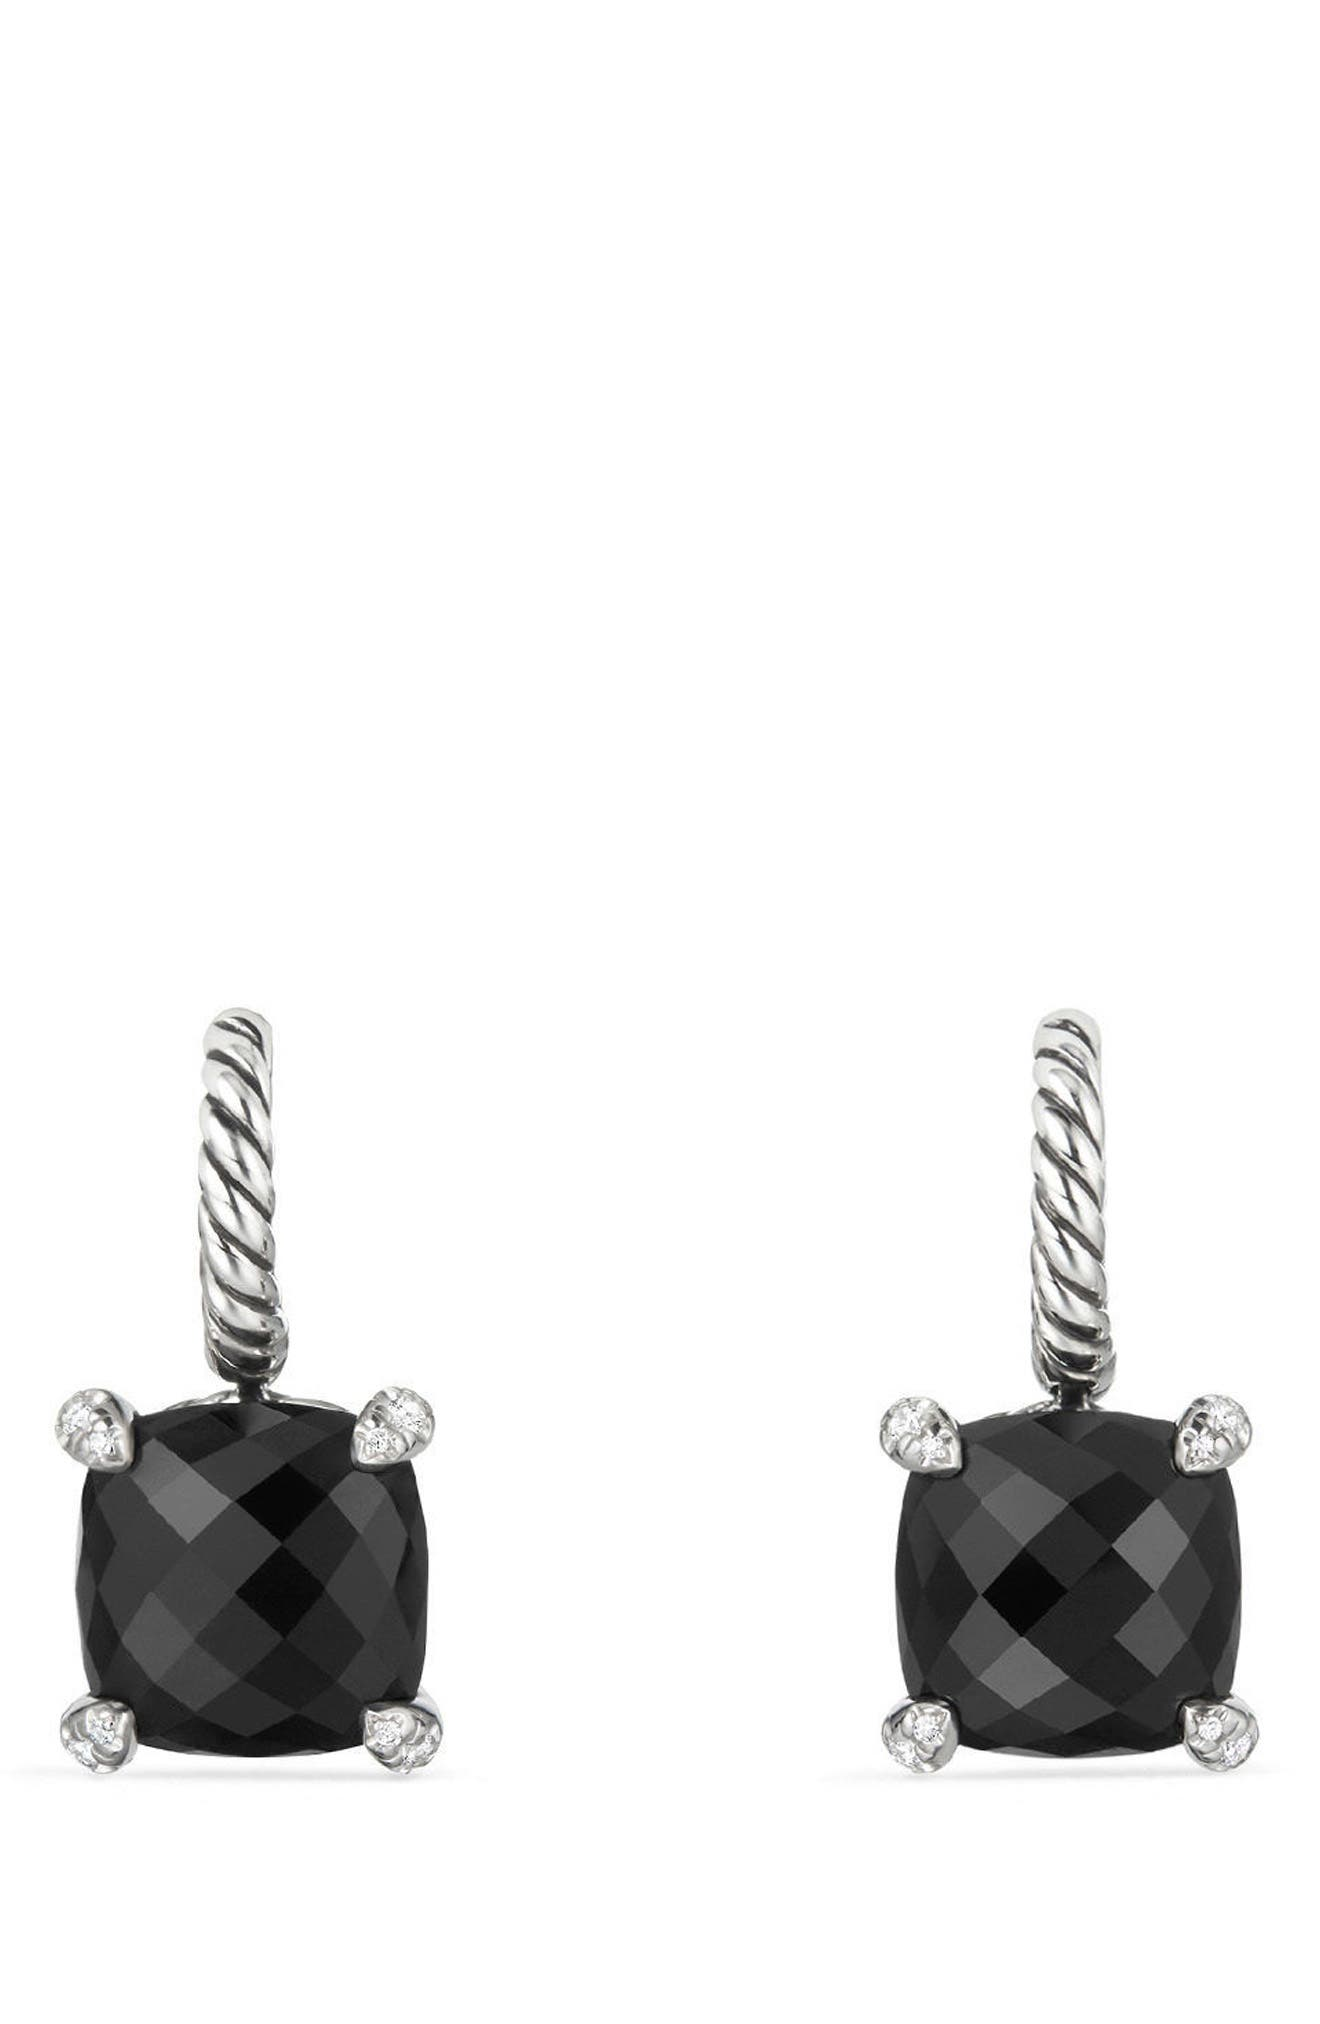 Châtelaine Drop Earrings with Diamonds,                         Main,                         color, Black Onyx